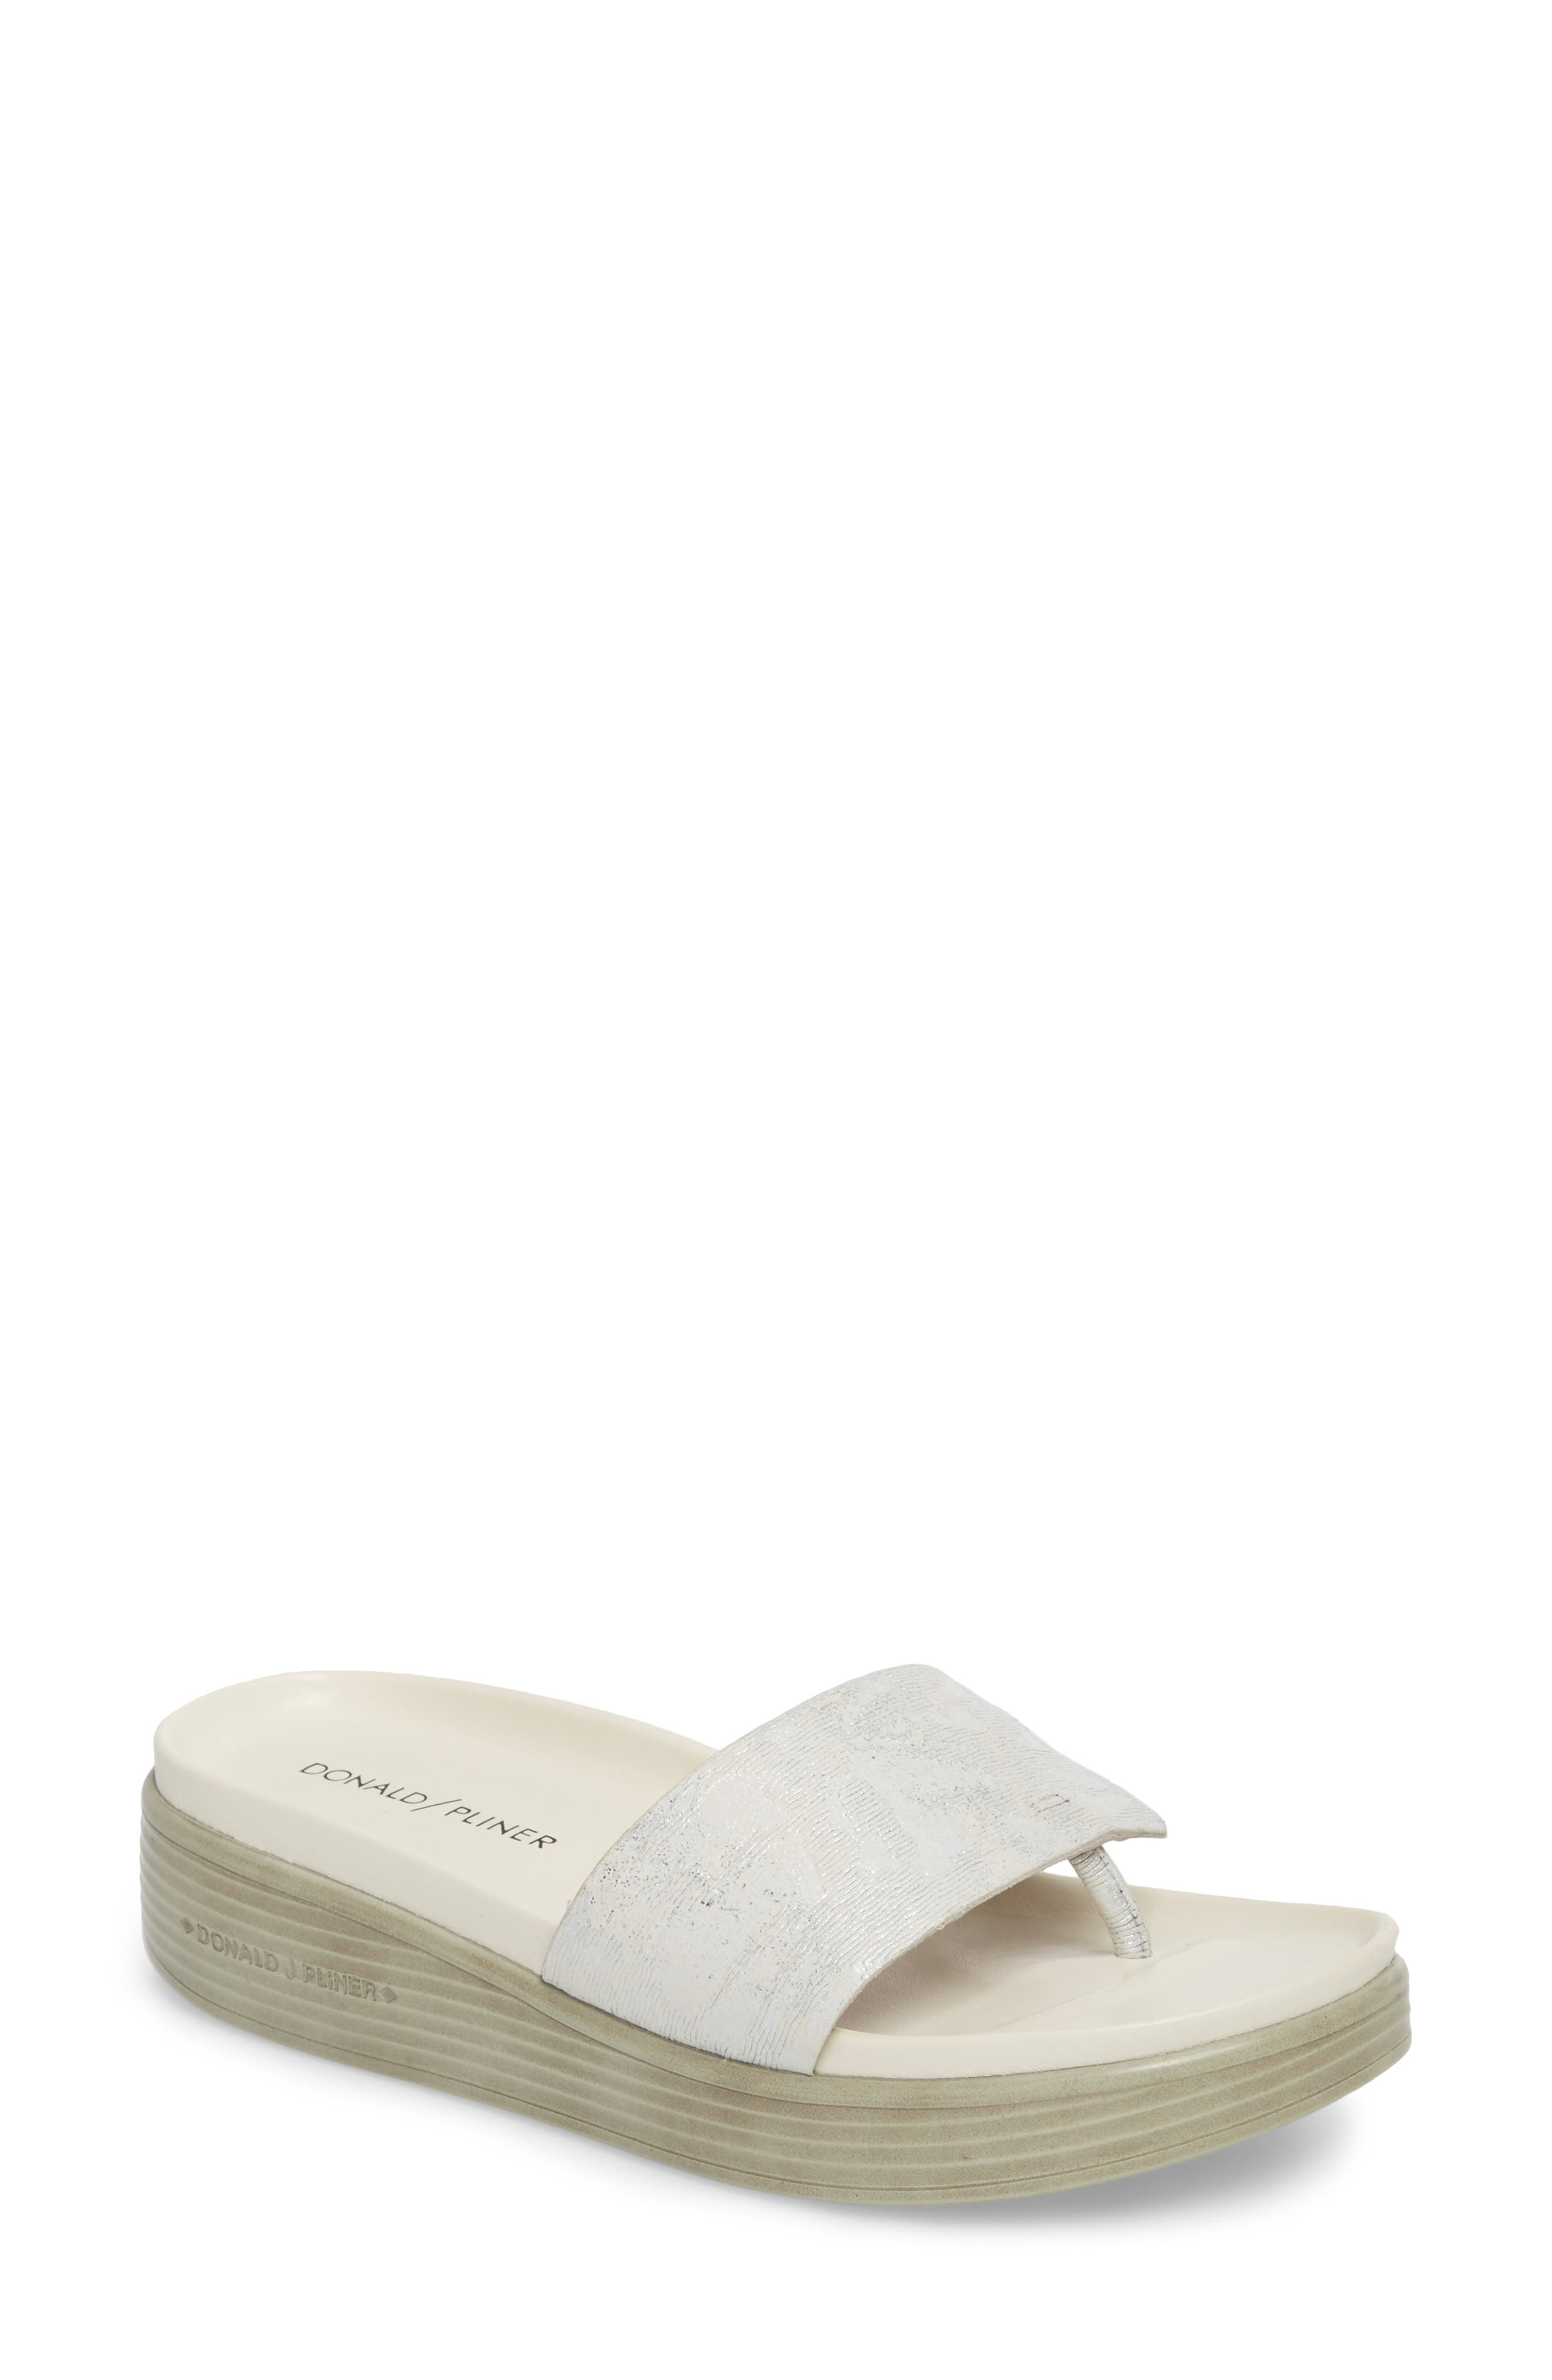 Fifi Slide Sandal,                         Main,                         color, Silver Leather